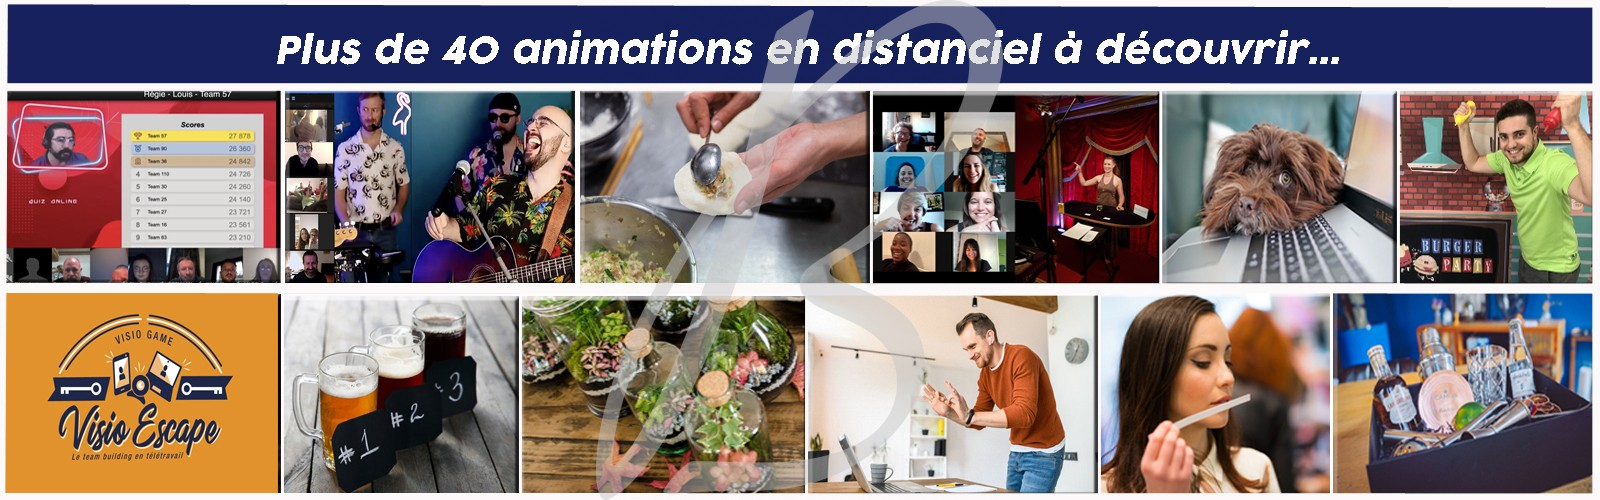 animations-en-distanciel-teletravail-boite-a-idees-bea-conception